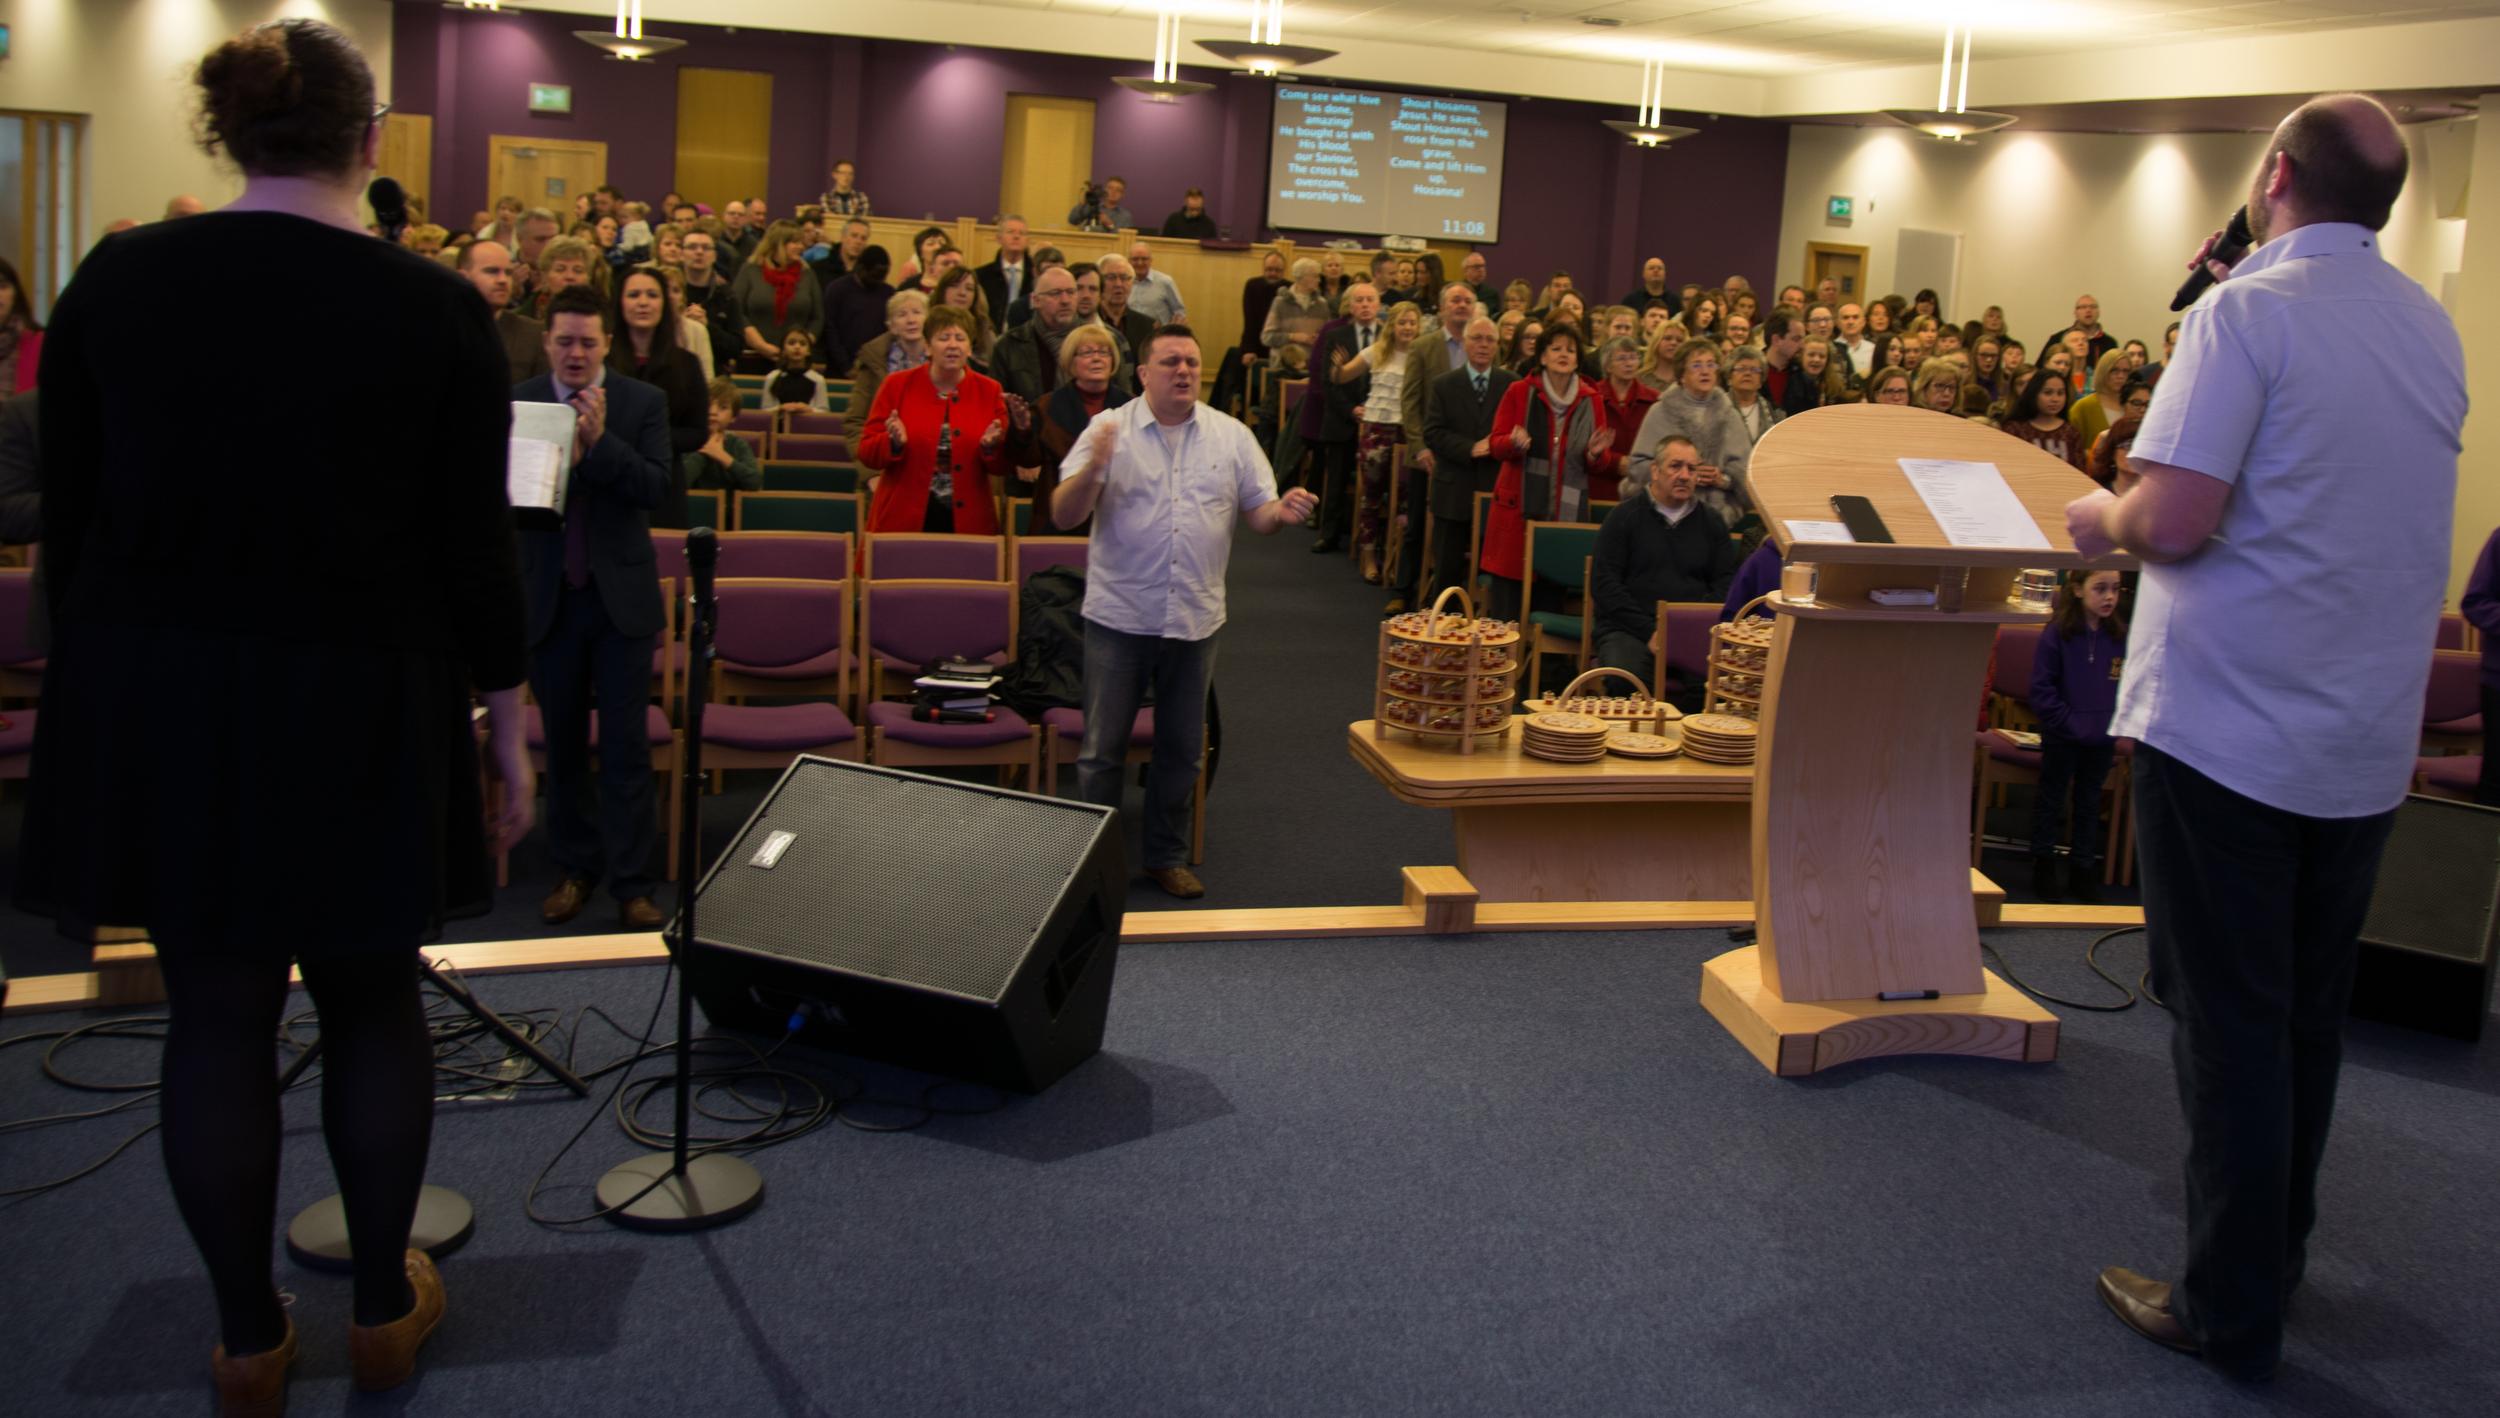 Hope Church 2016 (7 of 42).jpg